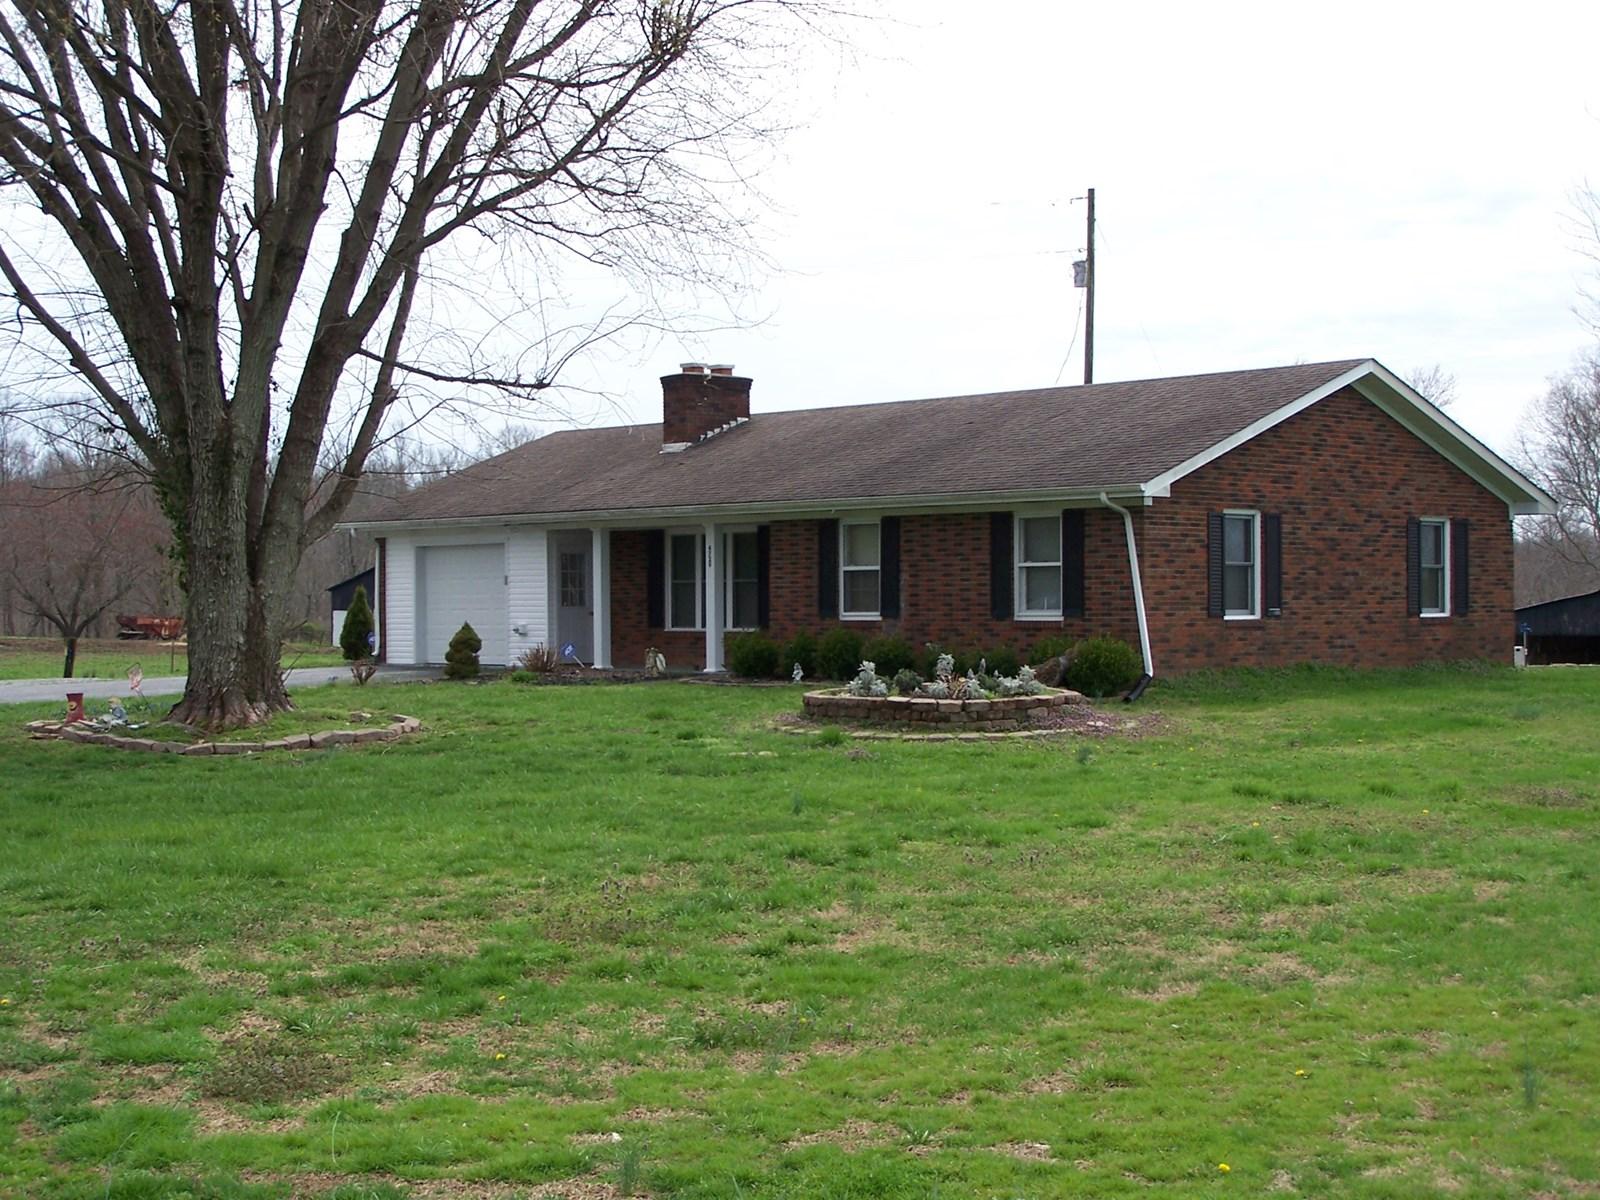 BRICK HOME - 8 ACRES - 2 BARNS - LARGE POND - LIBERTY, KY